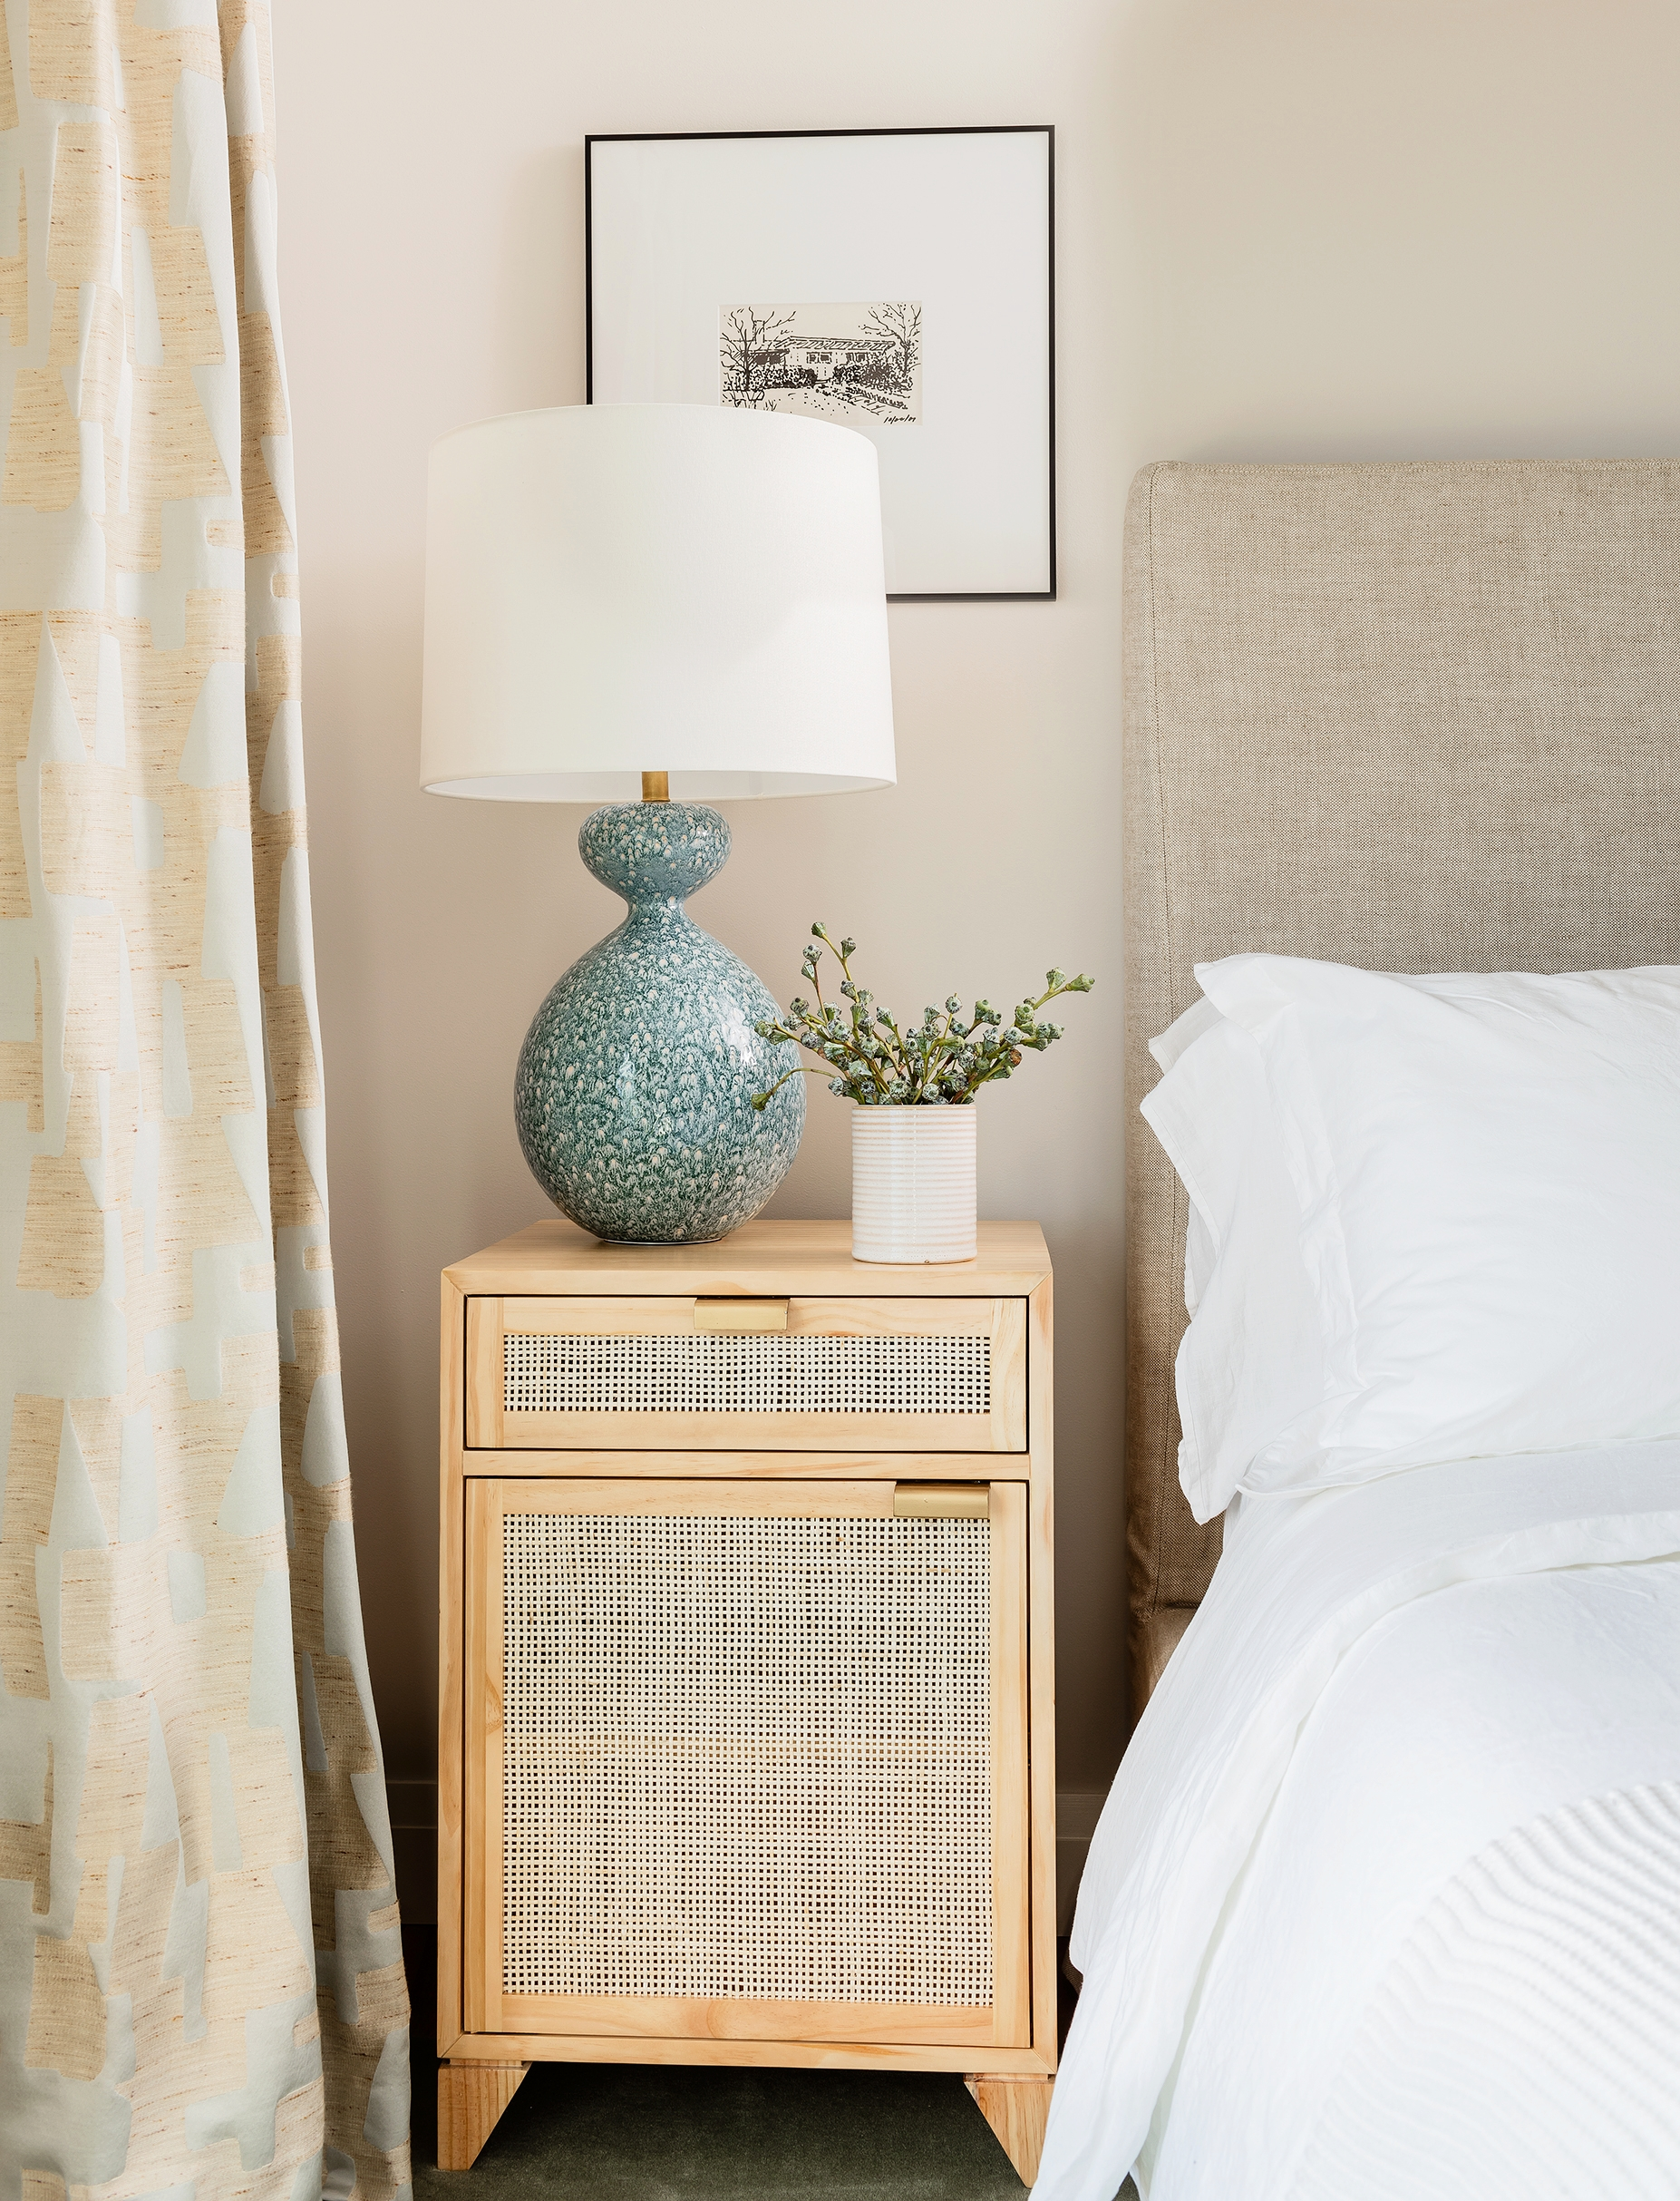 pier-4-model-guest-bed-hudson-interior-designs.jpg